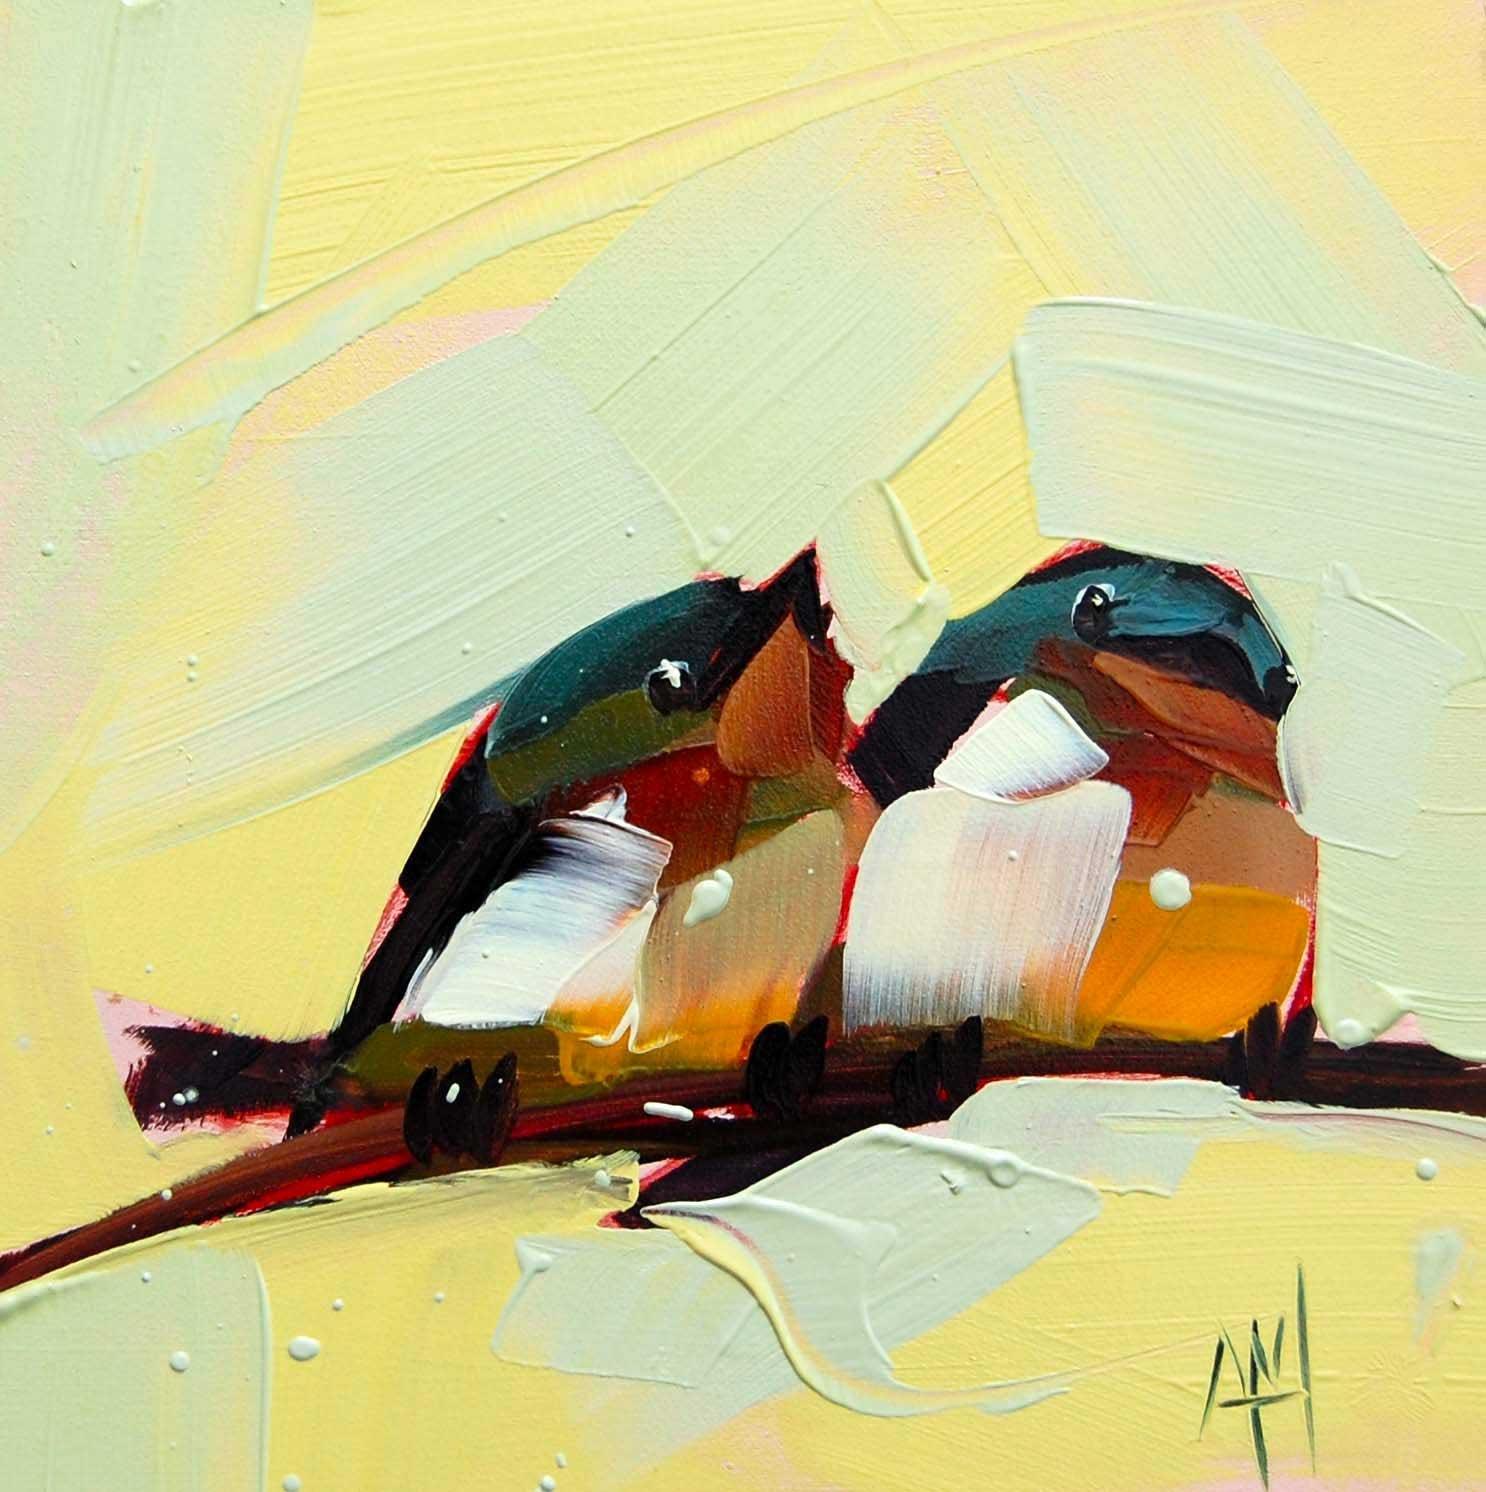 Grobgestrichene Vögel Angela-Moulton_01